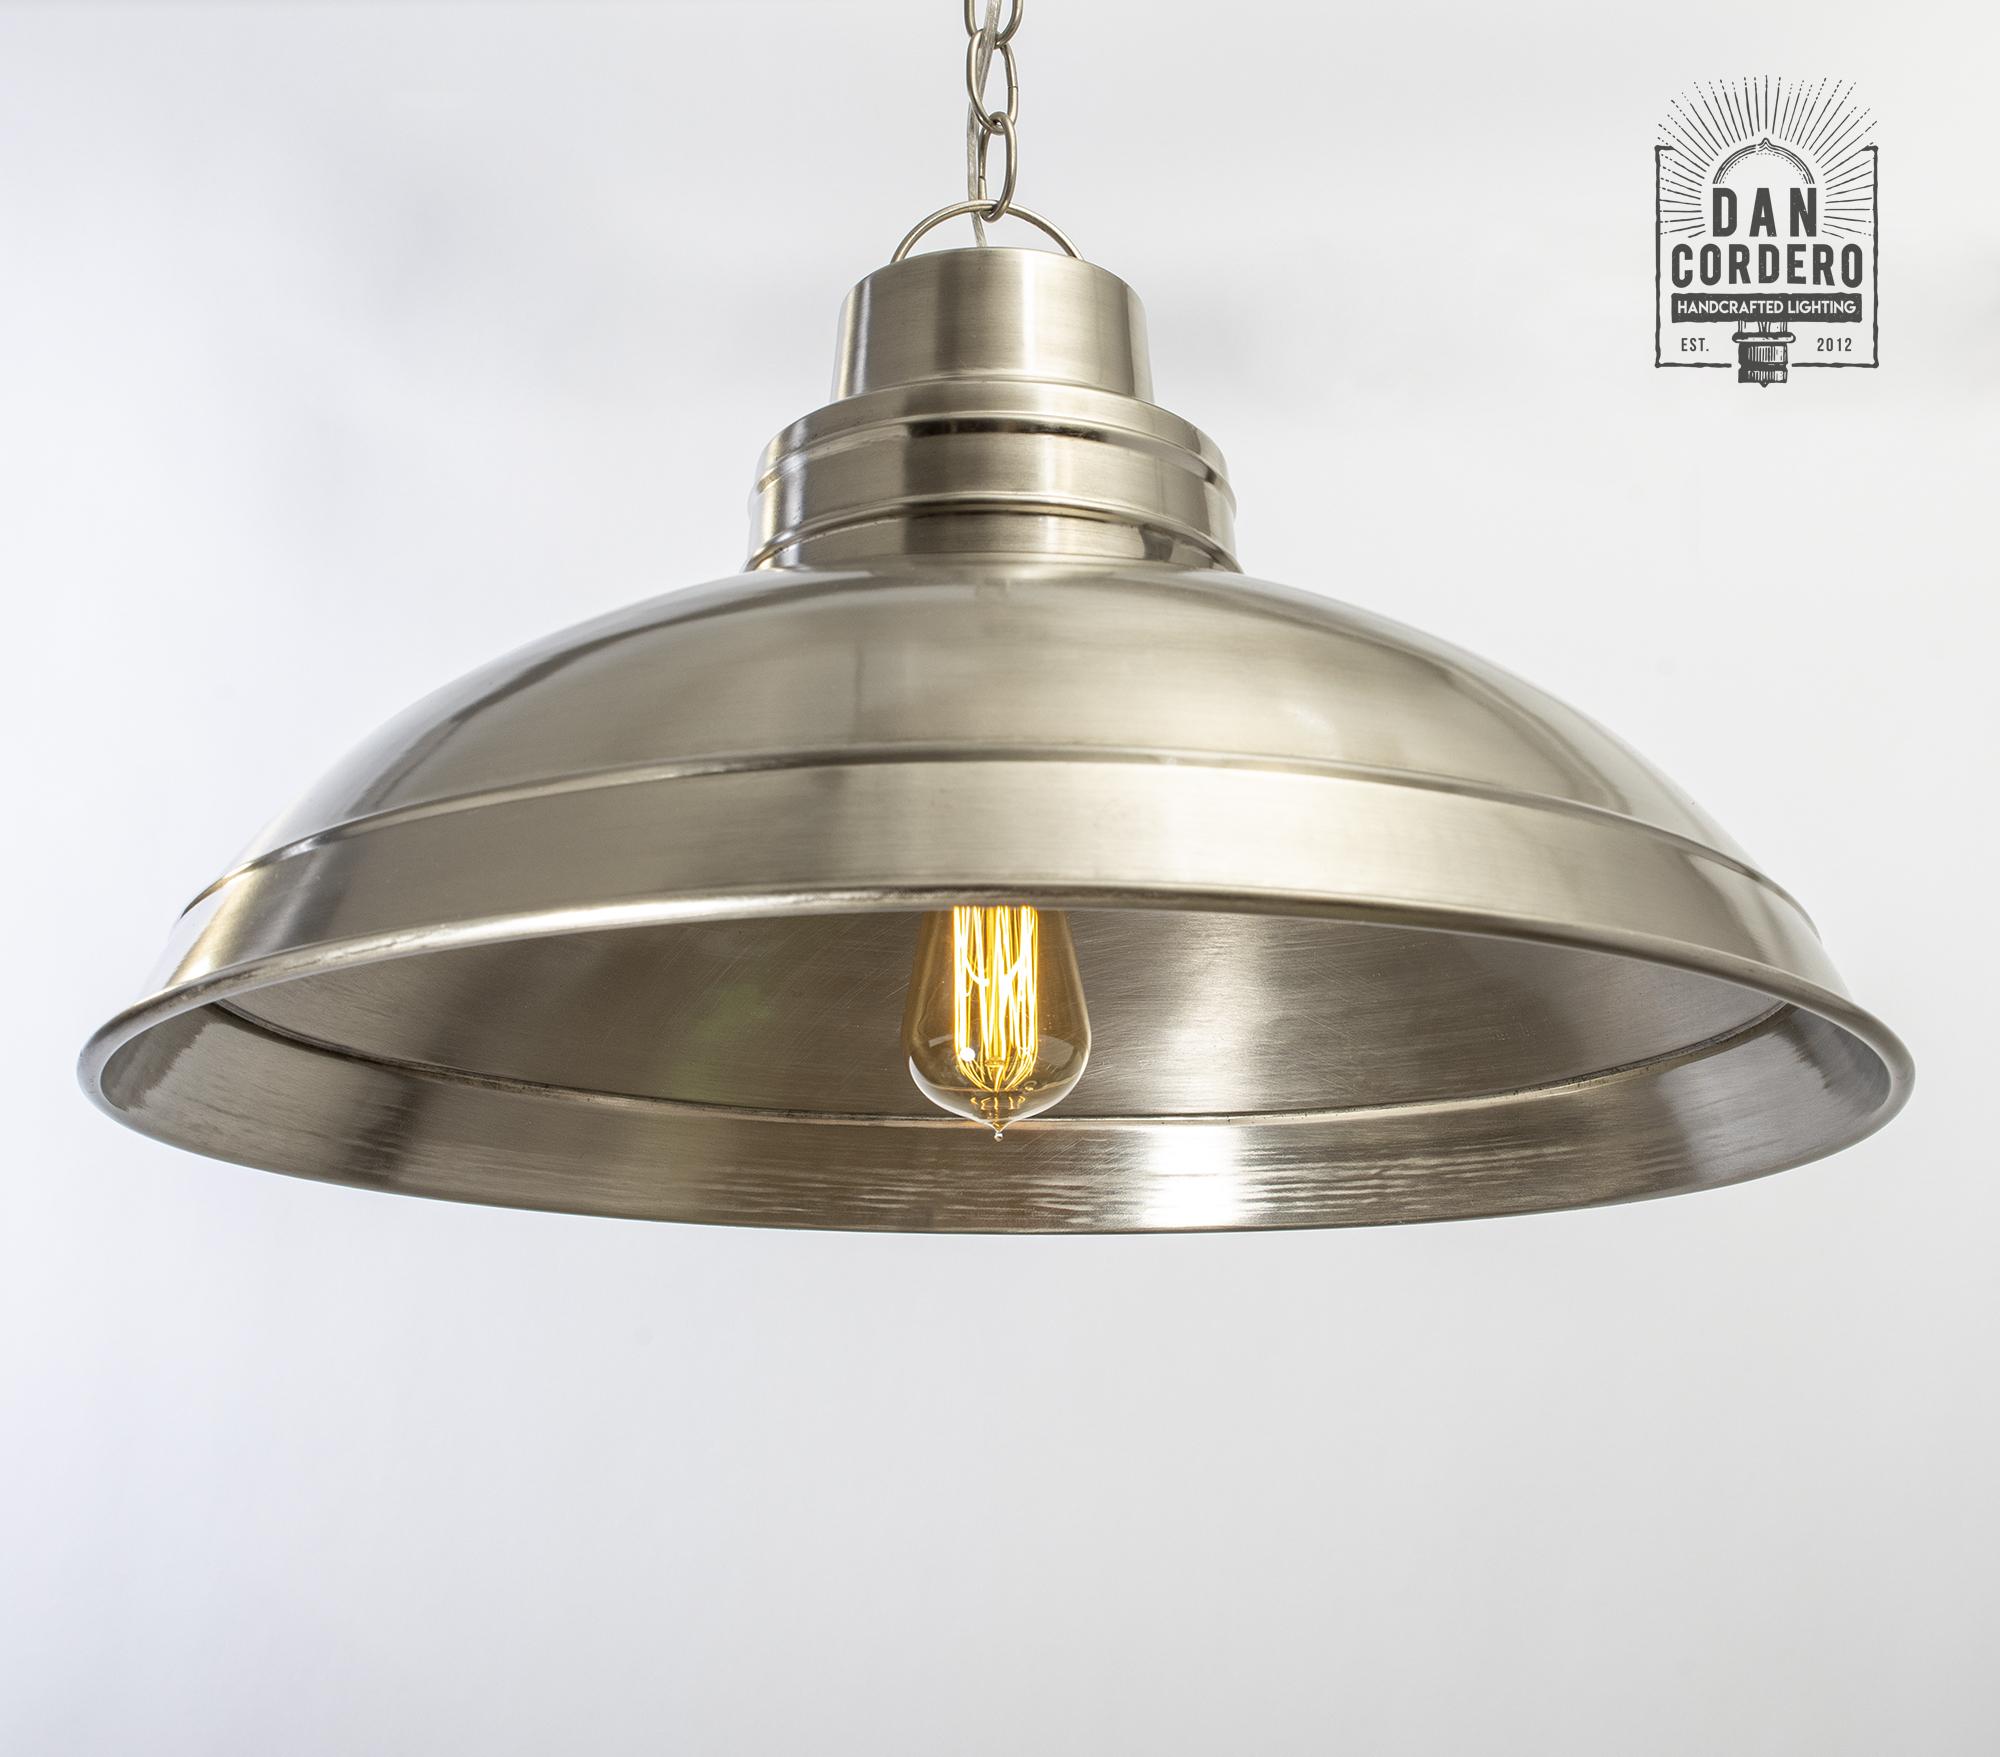 Clayton Dome Pendant Light Fixture | Dan Cordero ...